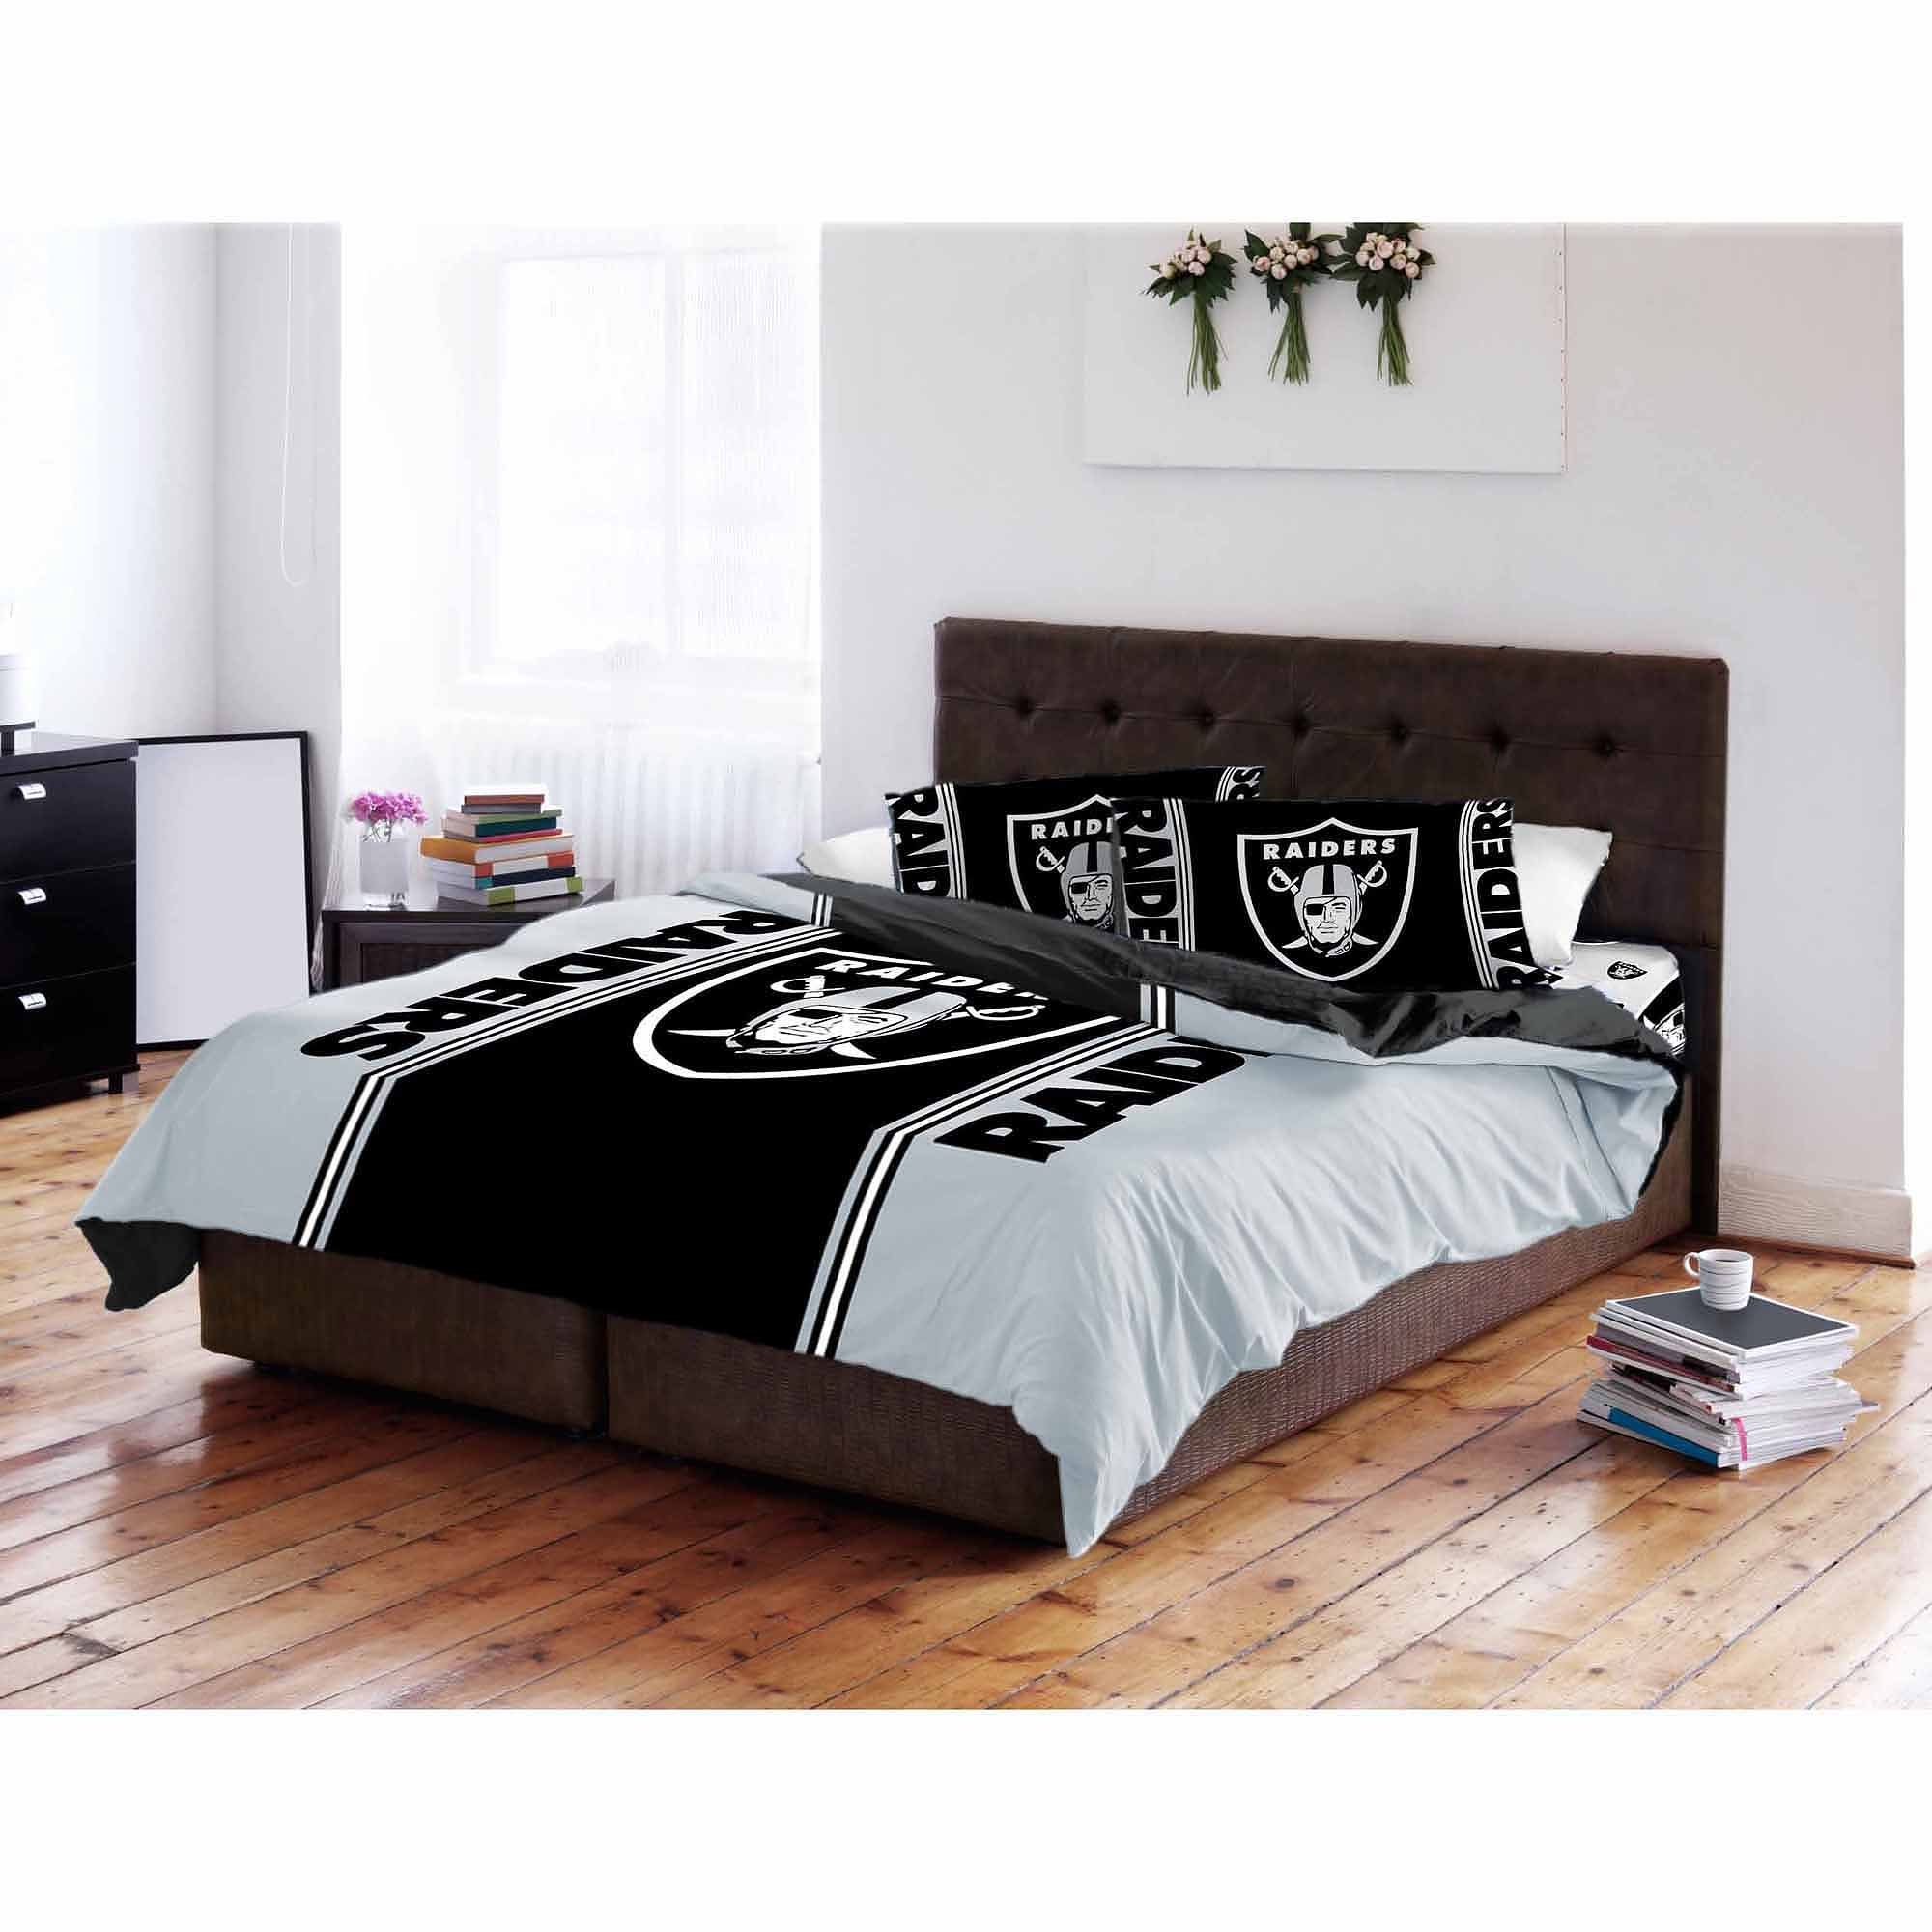 Nfl Oakland Raiders T/f Comforter